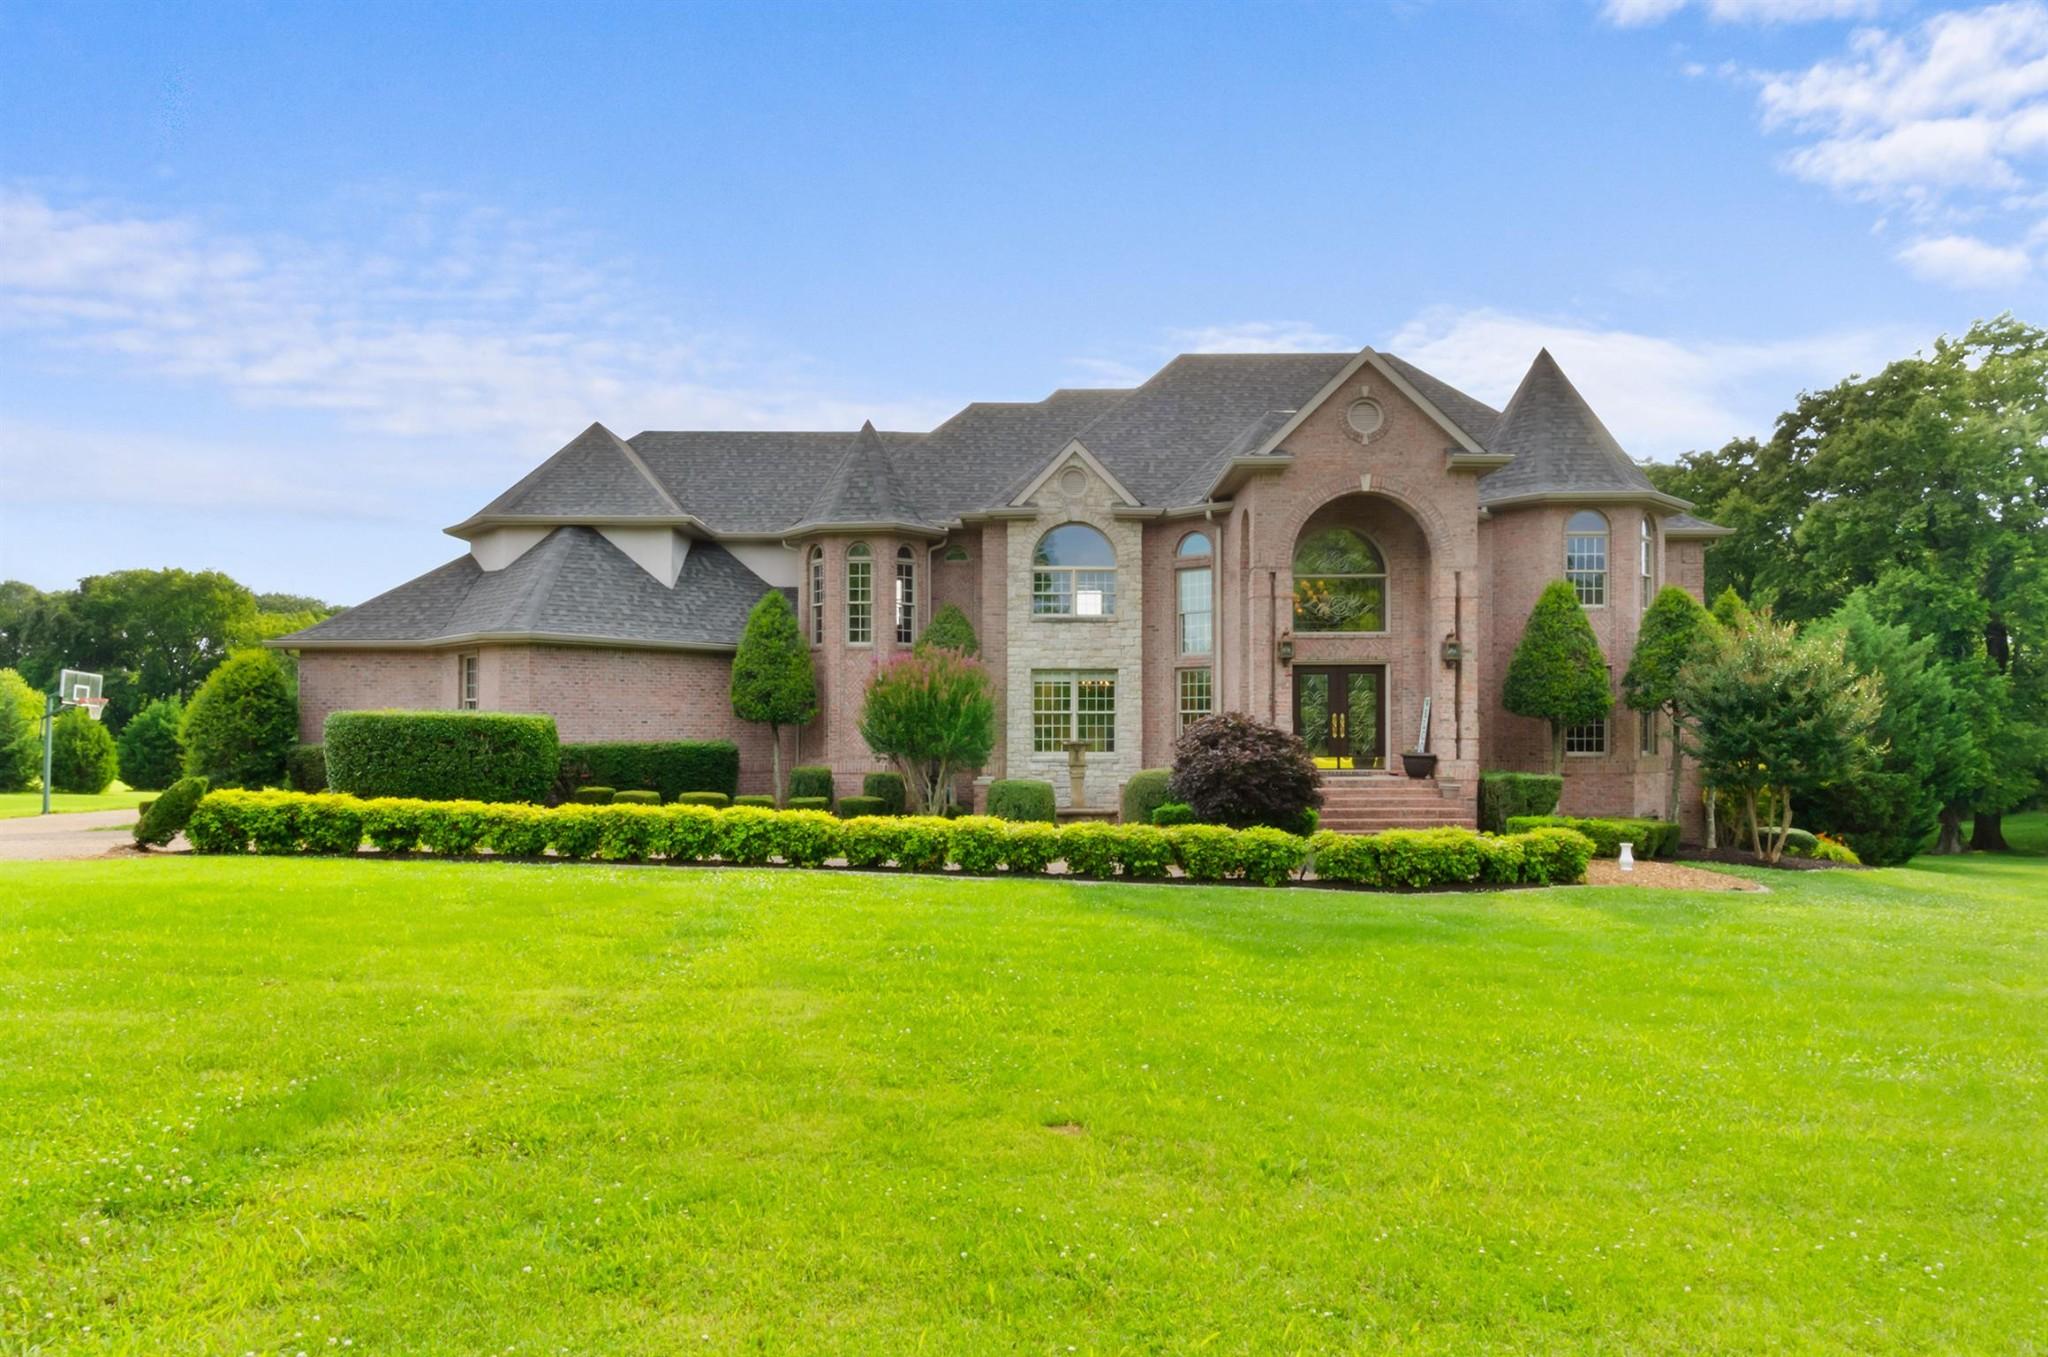 1530 Palmer Rd, Lebanon, TN 37090 - Lebanon, TN real estate listing